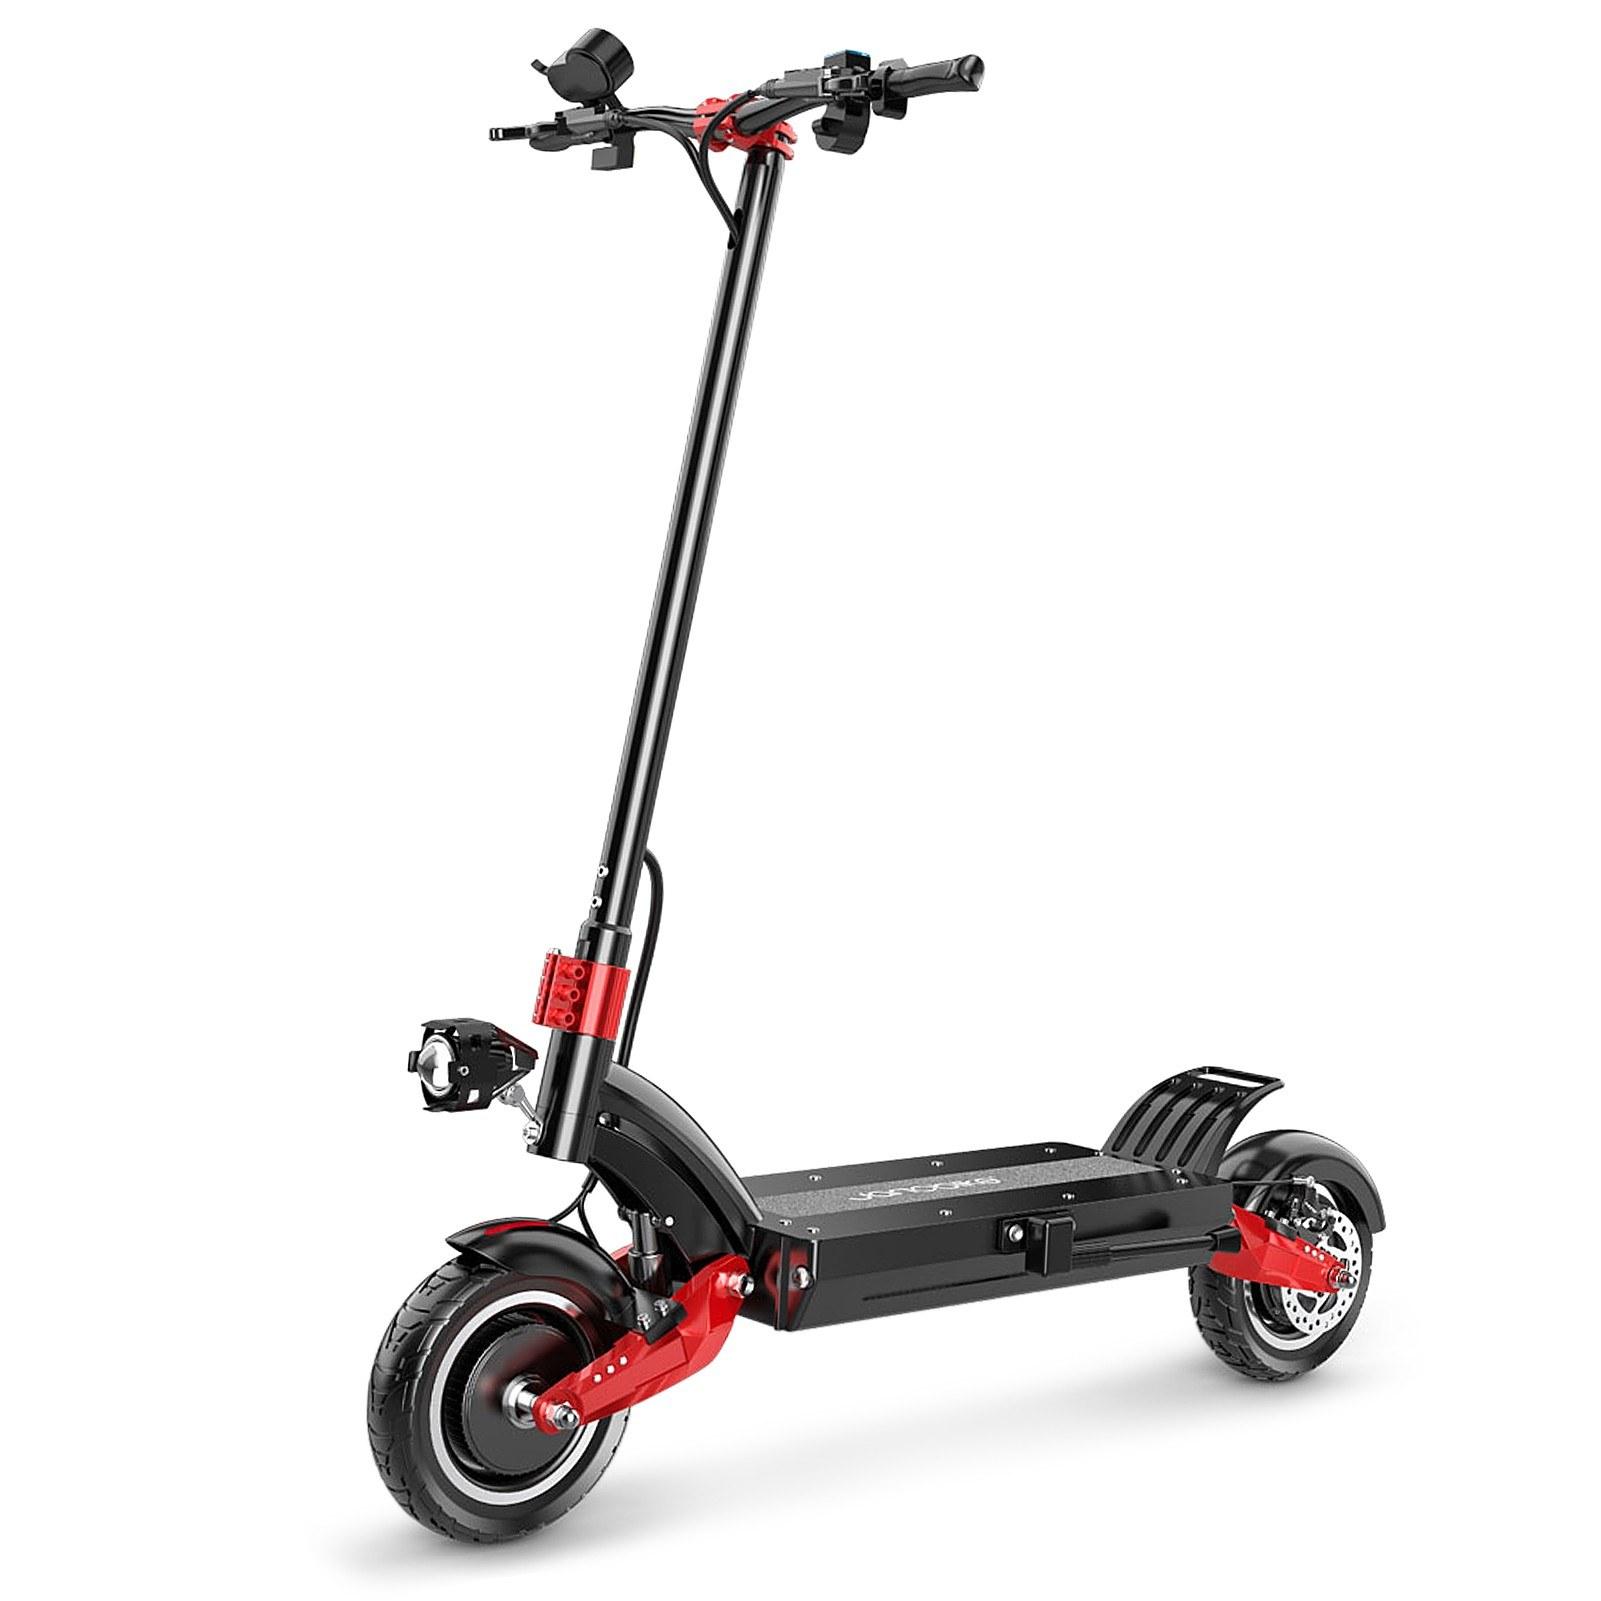 cafago.com - 46% OFF Janobike X10 10inch Wheels 1200W Dual Motor Electric Scooter,free shipping+$1219.91